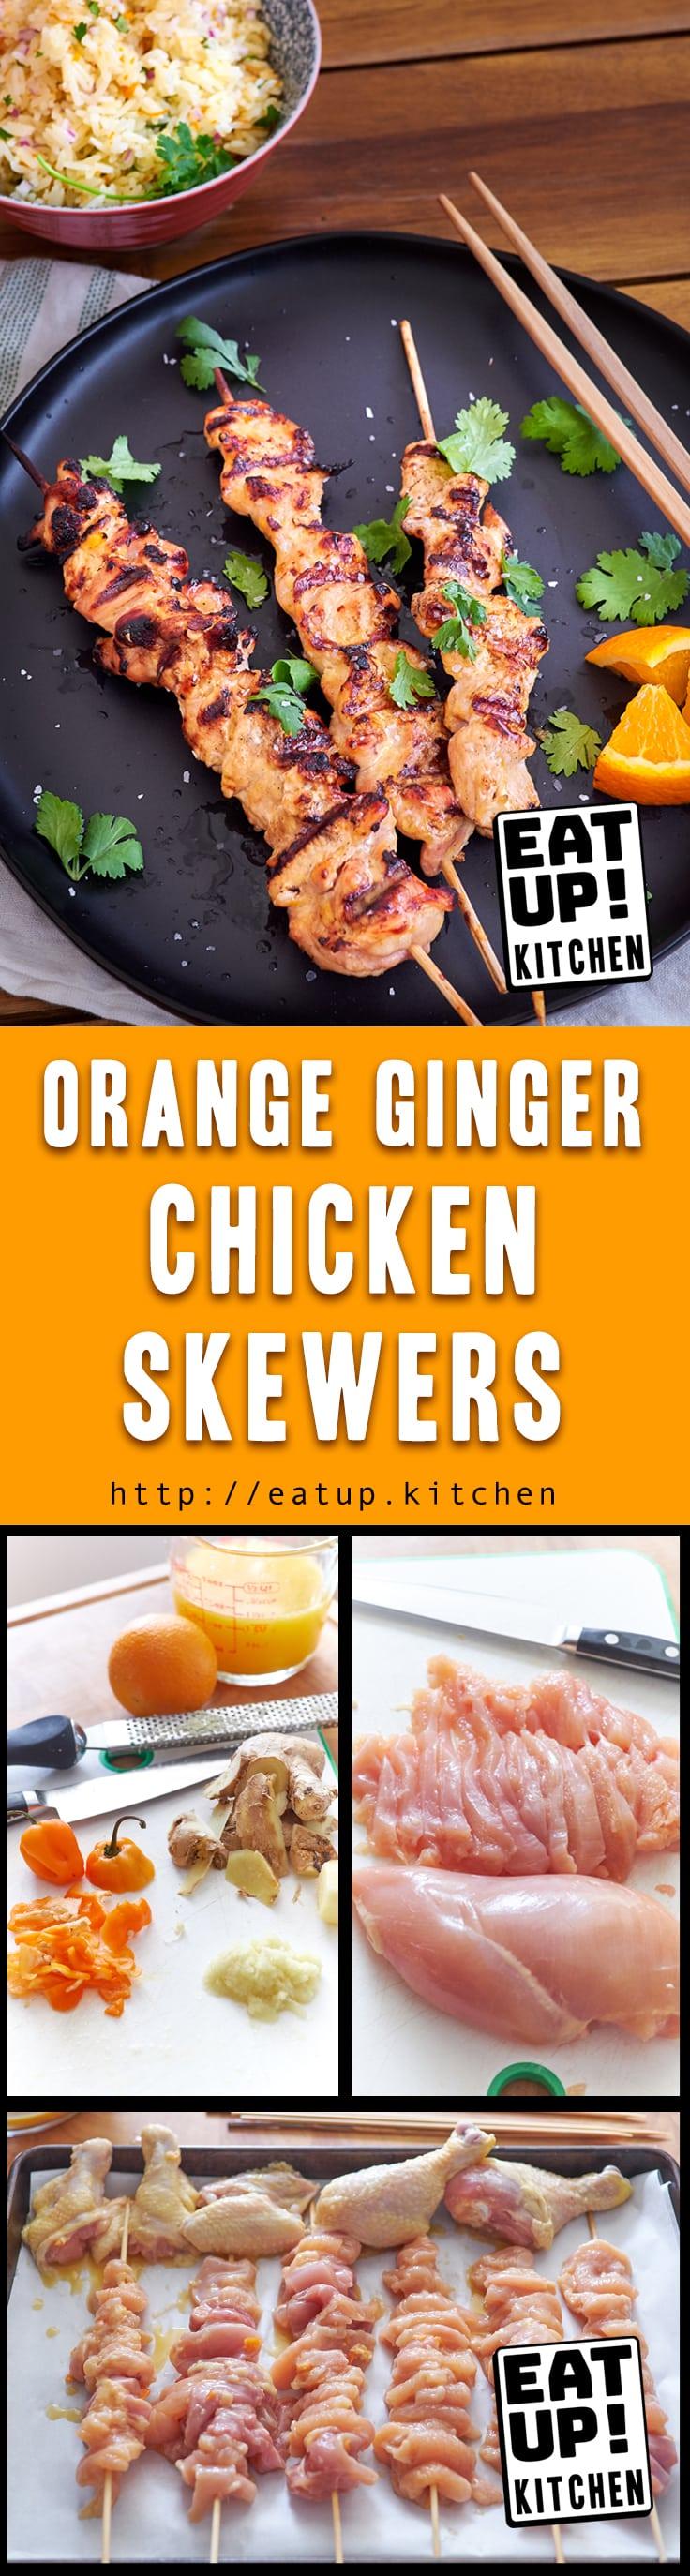 Orange Ginger Chicken Skewers